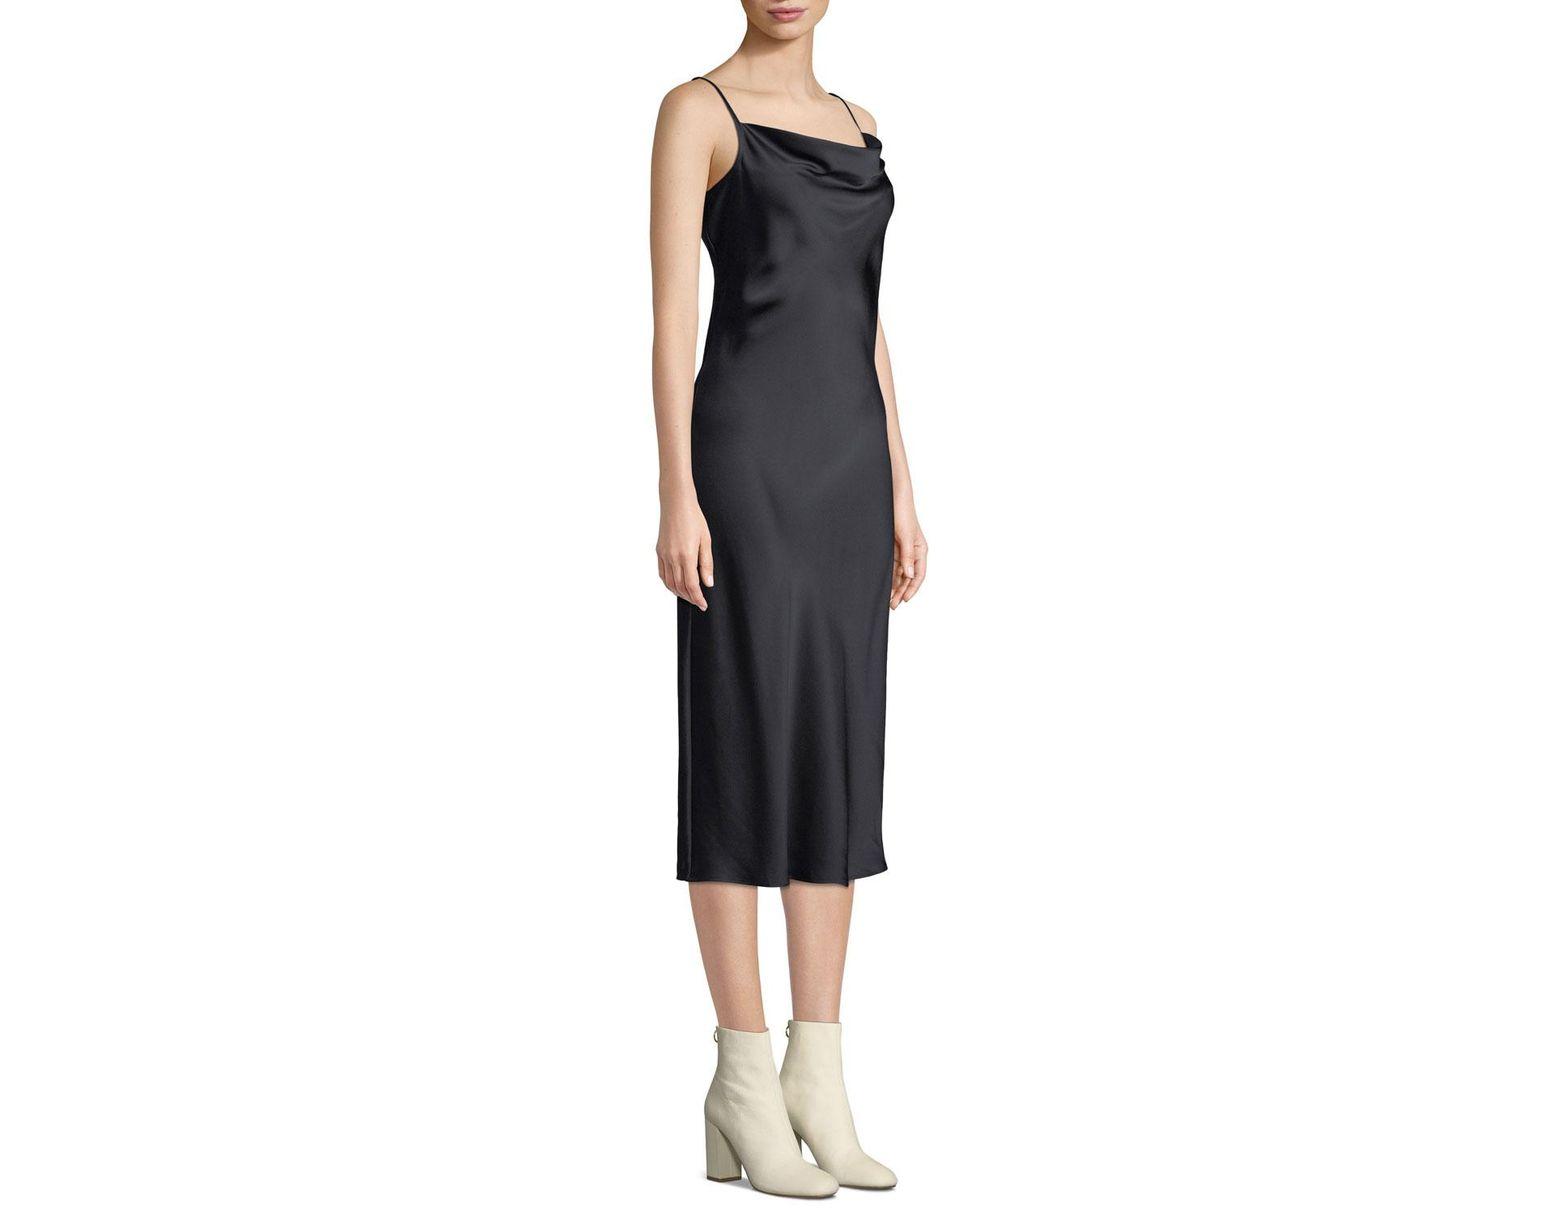 7d84b1609ed7 Joie Marcenna Cowl-neck Sleeveless Satin Midi Slip Dress in Black - Lyst